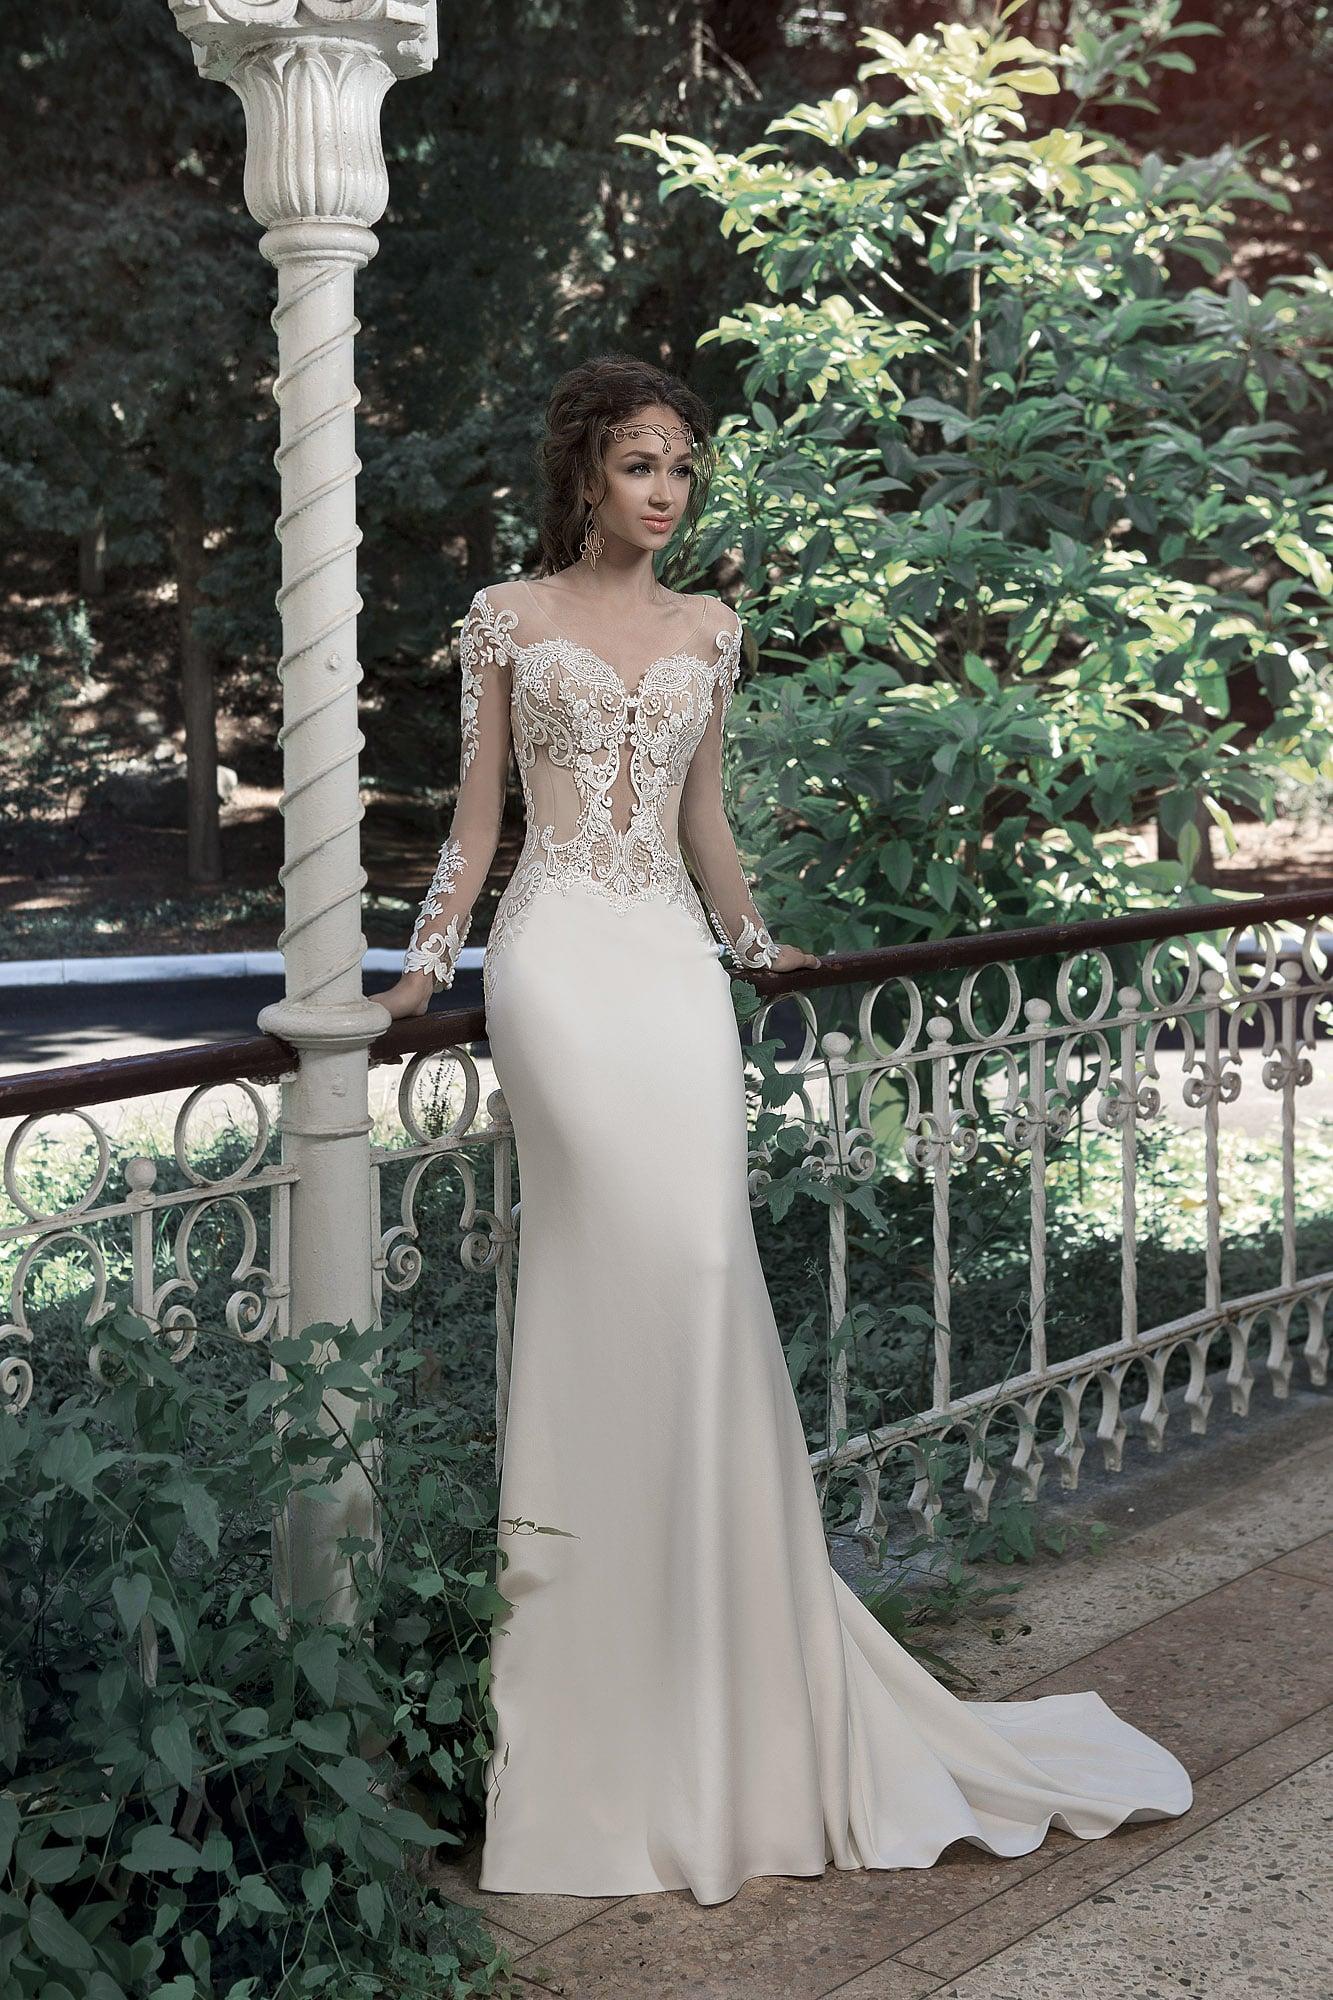 878a0b7344a Свадебное платье Milva Valletta. Купить свадебное платье в салоне ...